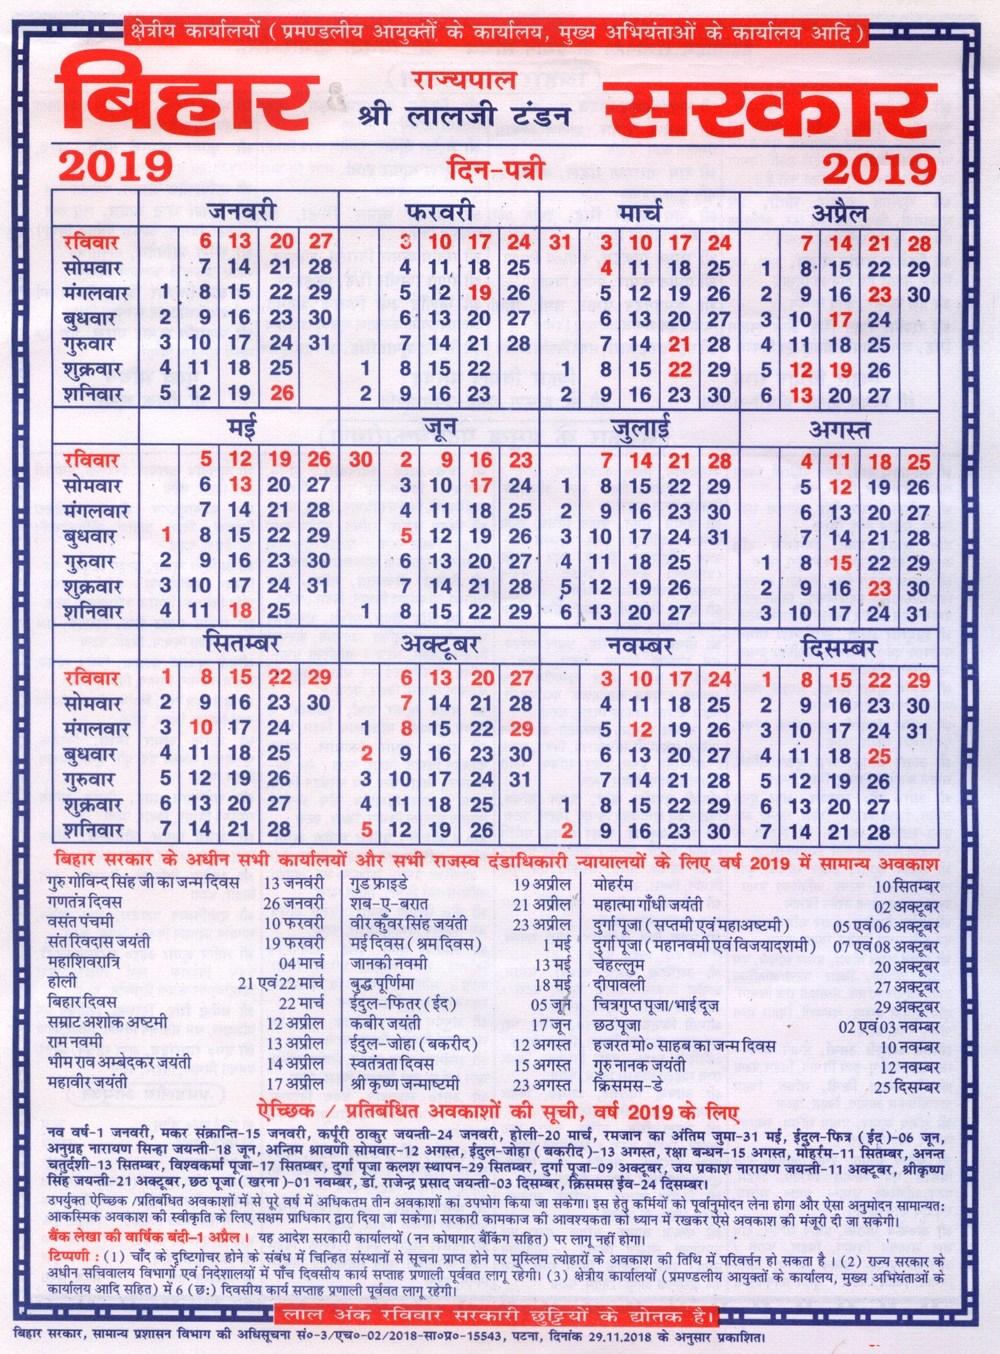 Bihar_Government_Calendar2019 | Bihar School for Bihar Govt Official Calendar 2020